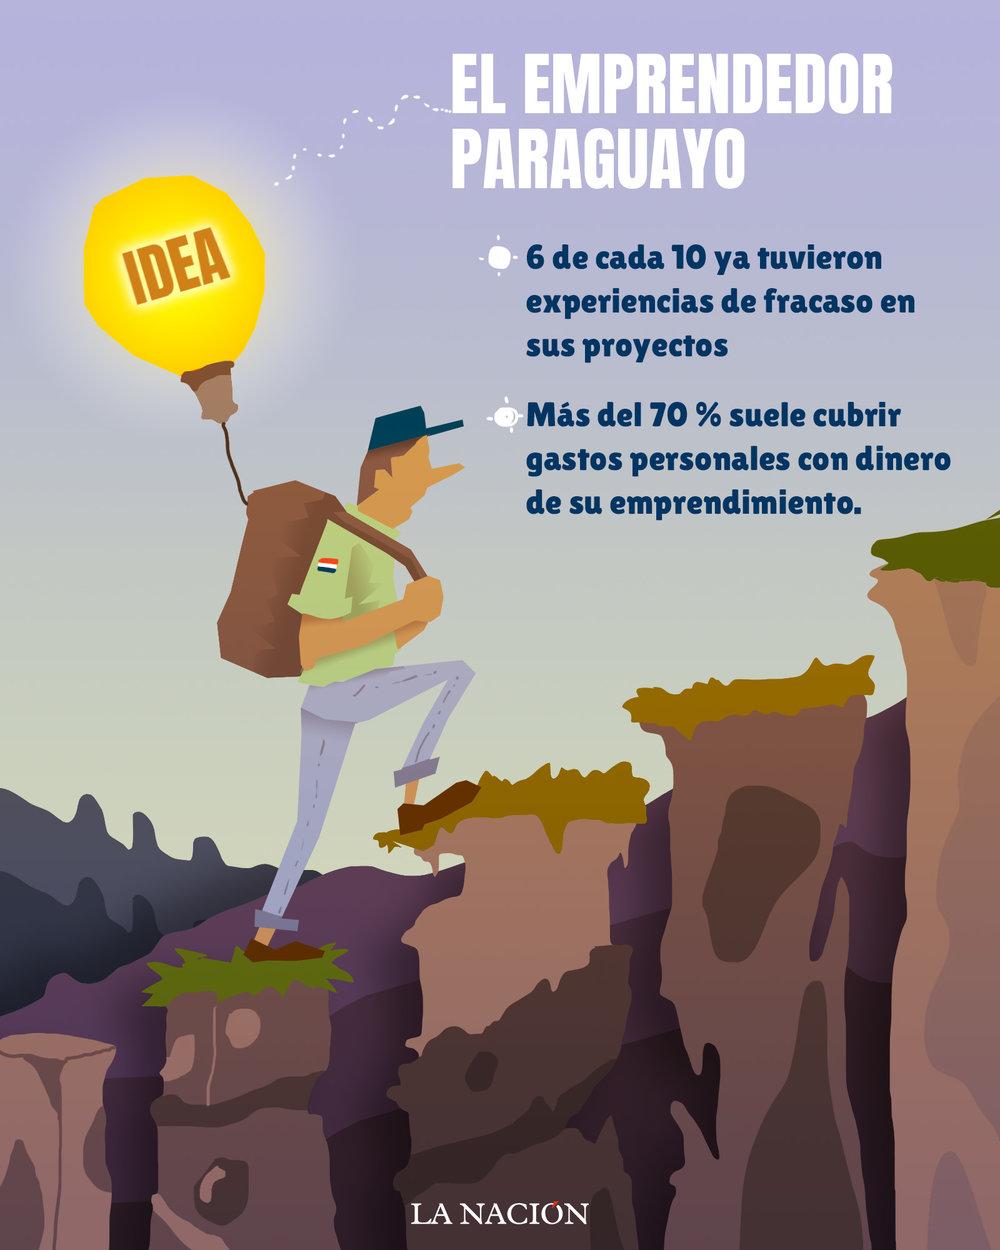 Emprendedor Paraguayo